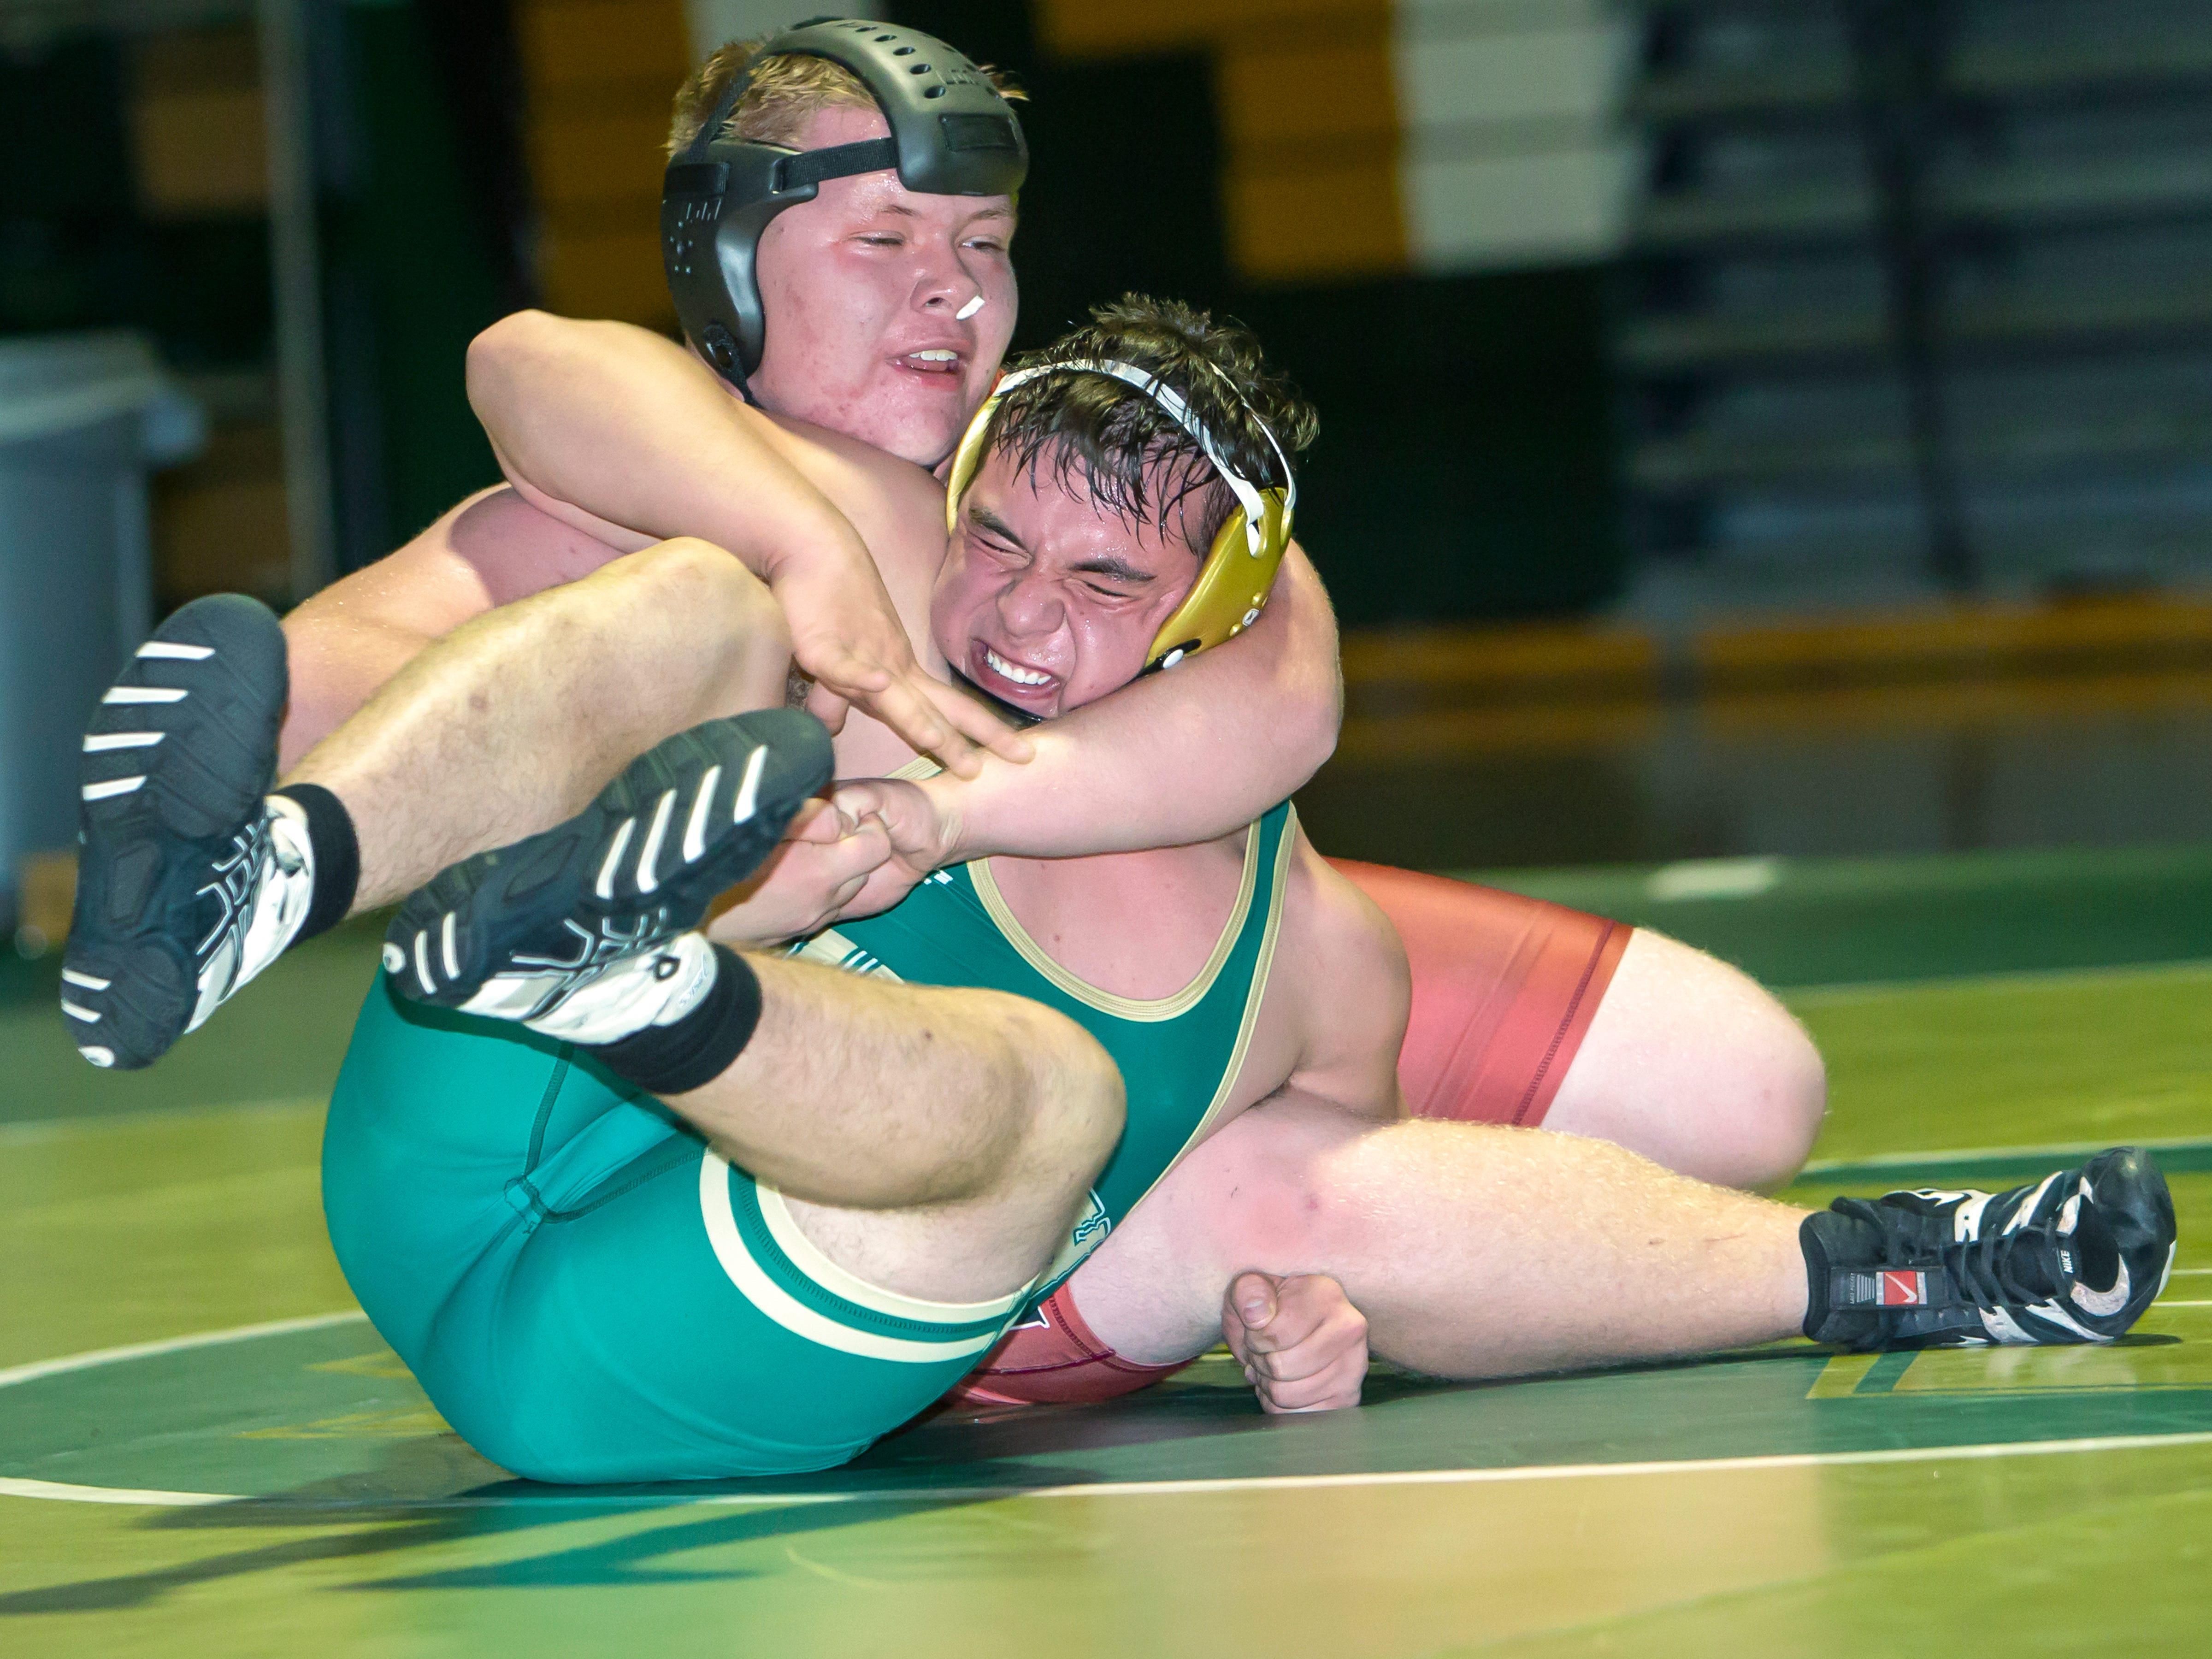 Oshkosh North's AJ Besaw wrestles Fond du Lac's Joey Schmitz in the 285 weight class at Oshkosh North High School on Thursday, November 29, 2018.